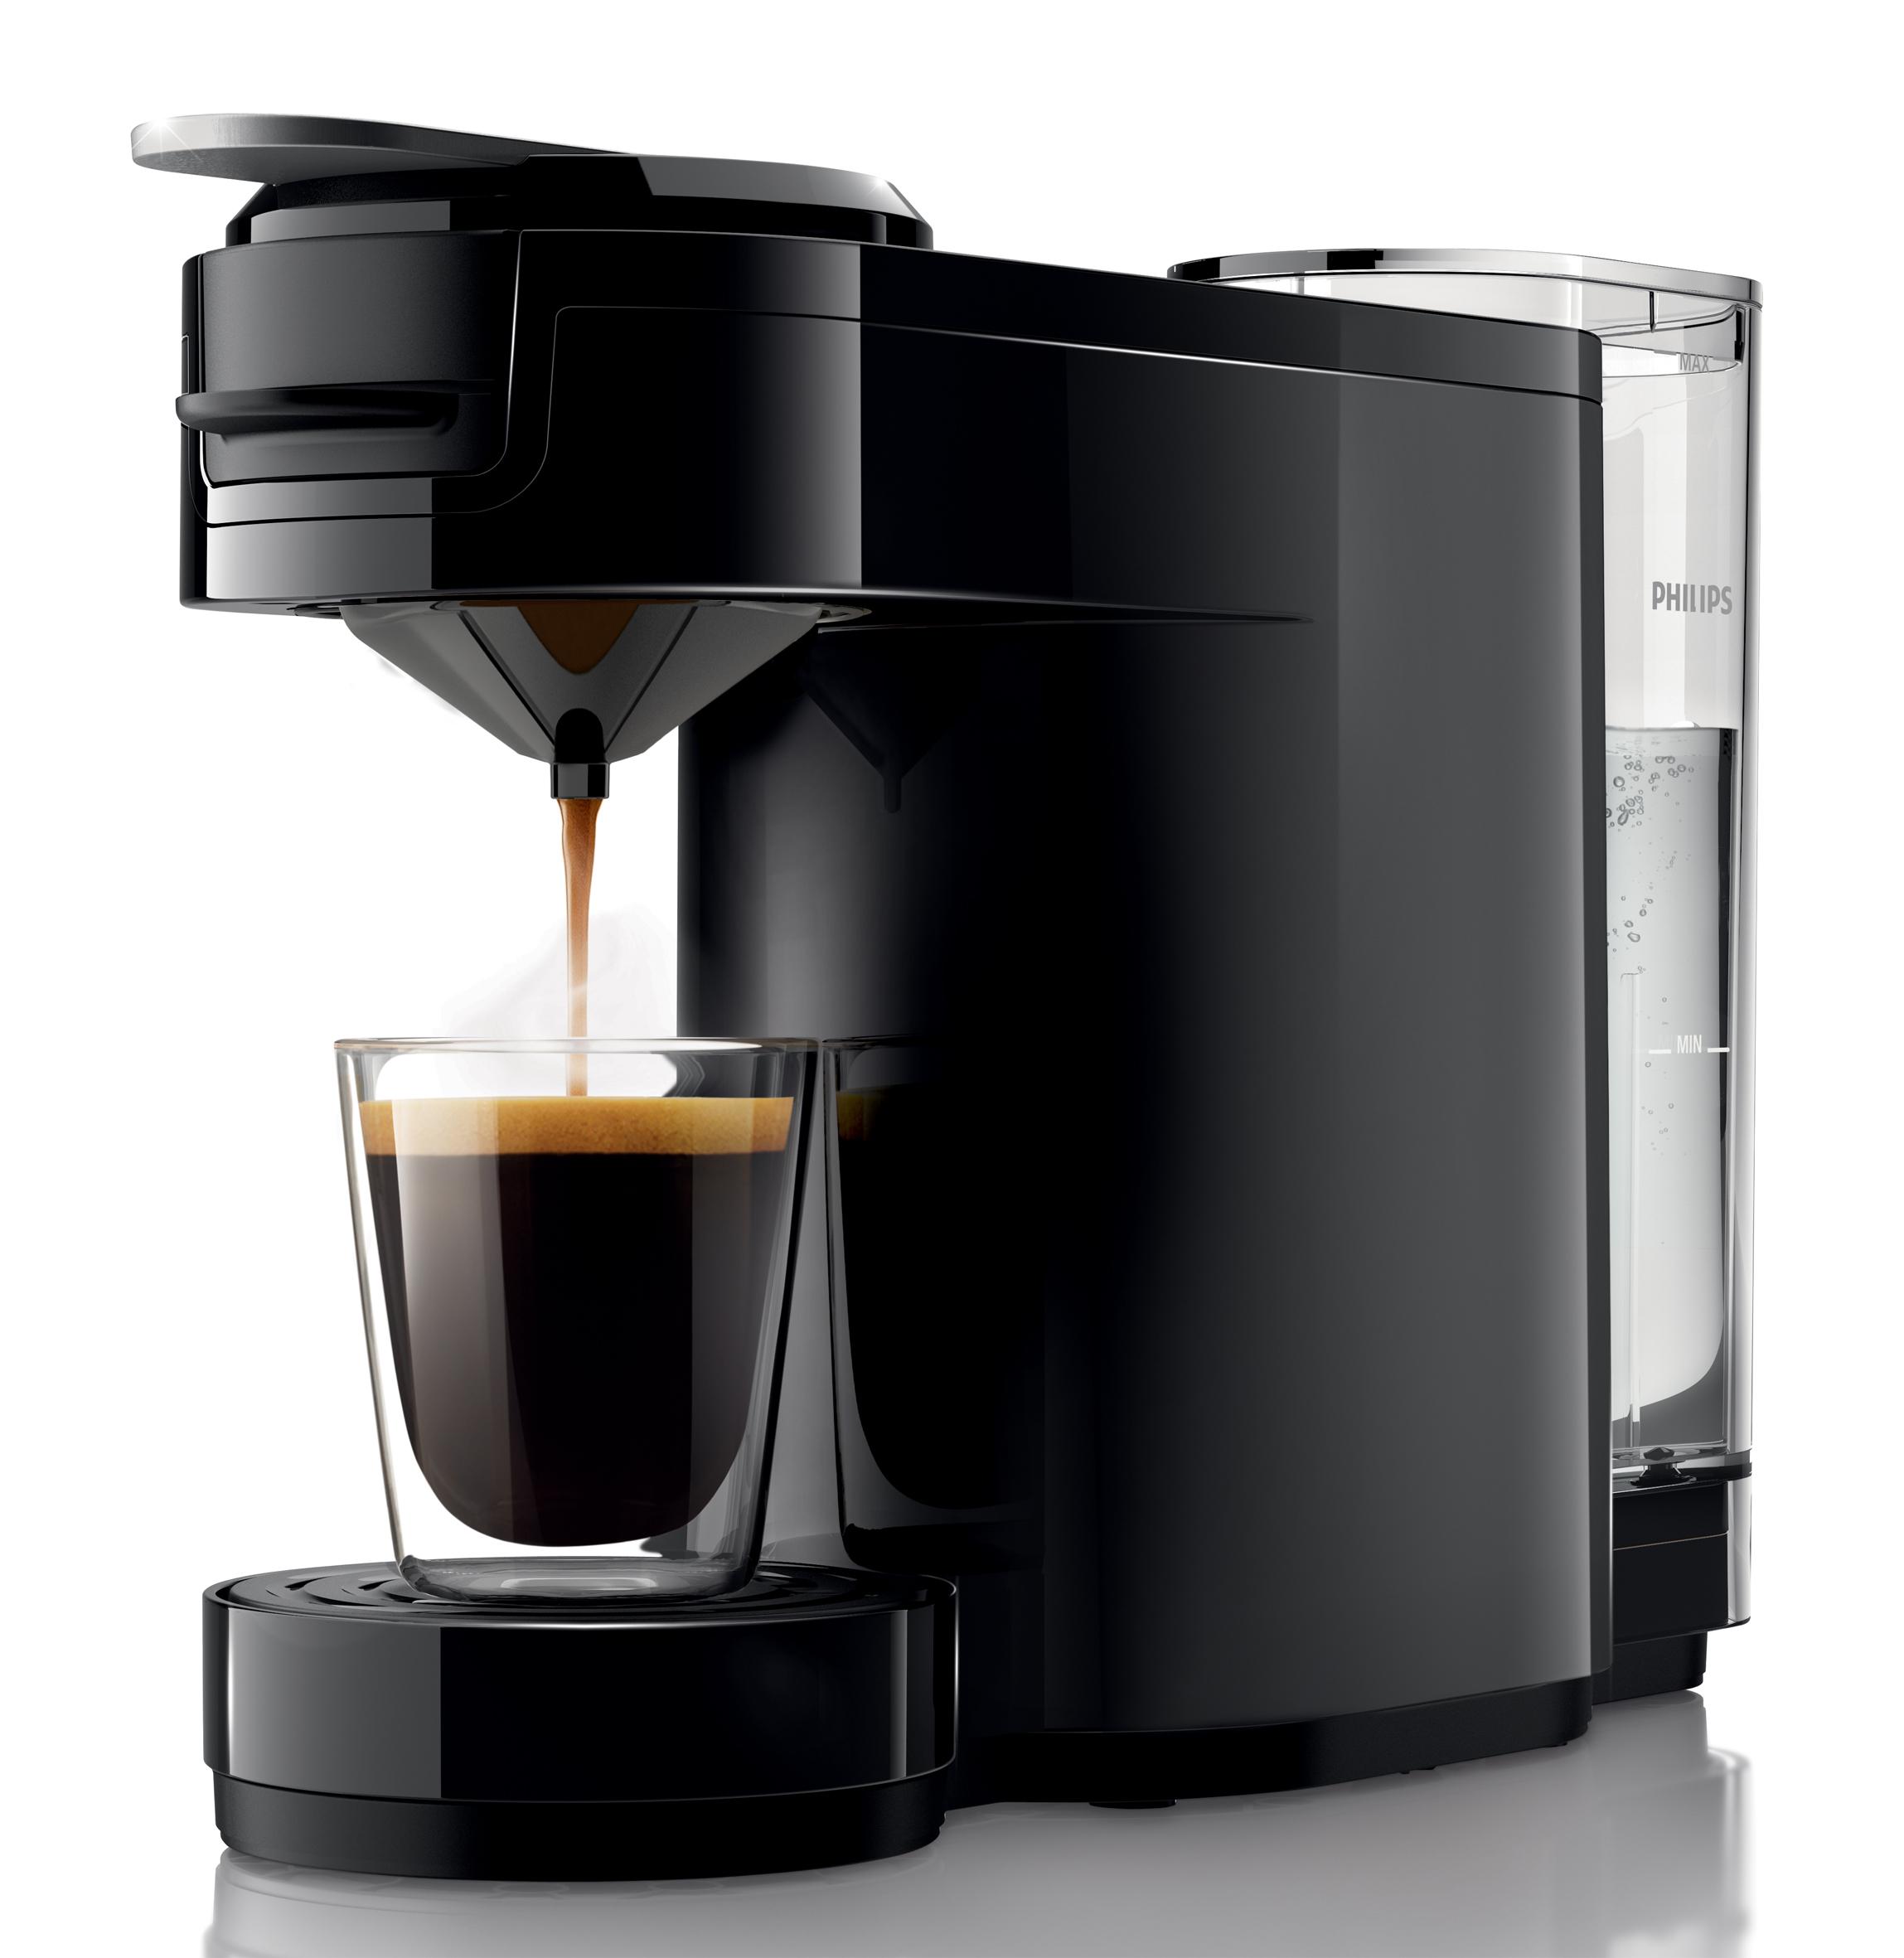 philips kaffeemaschine senseo up kompakte kaffeepadmaschine. Black Bedroom Furniture Sets. Home Design Ideas